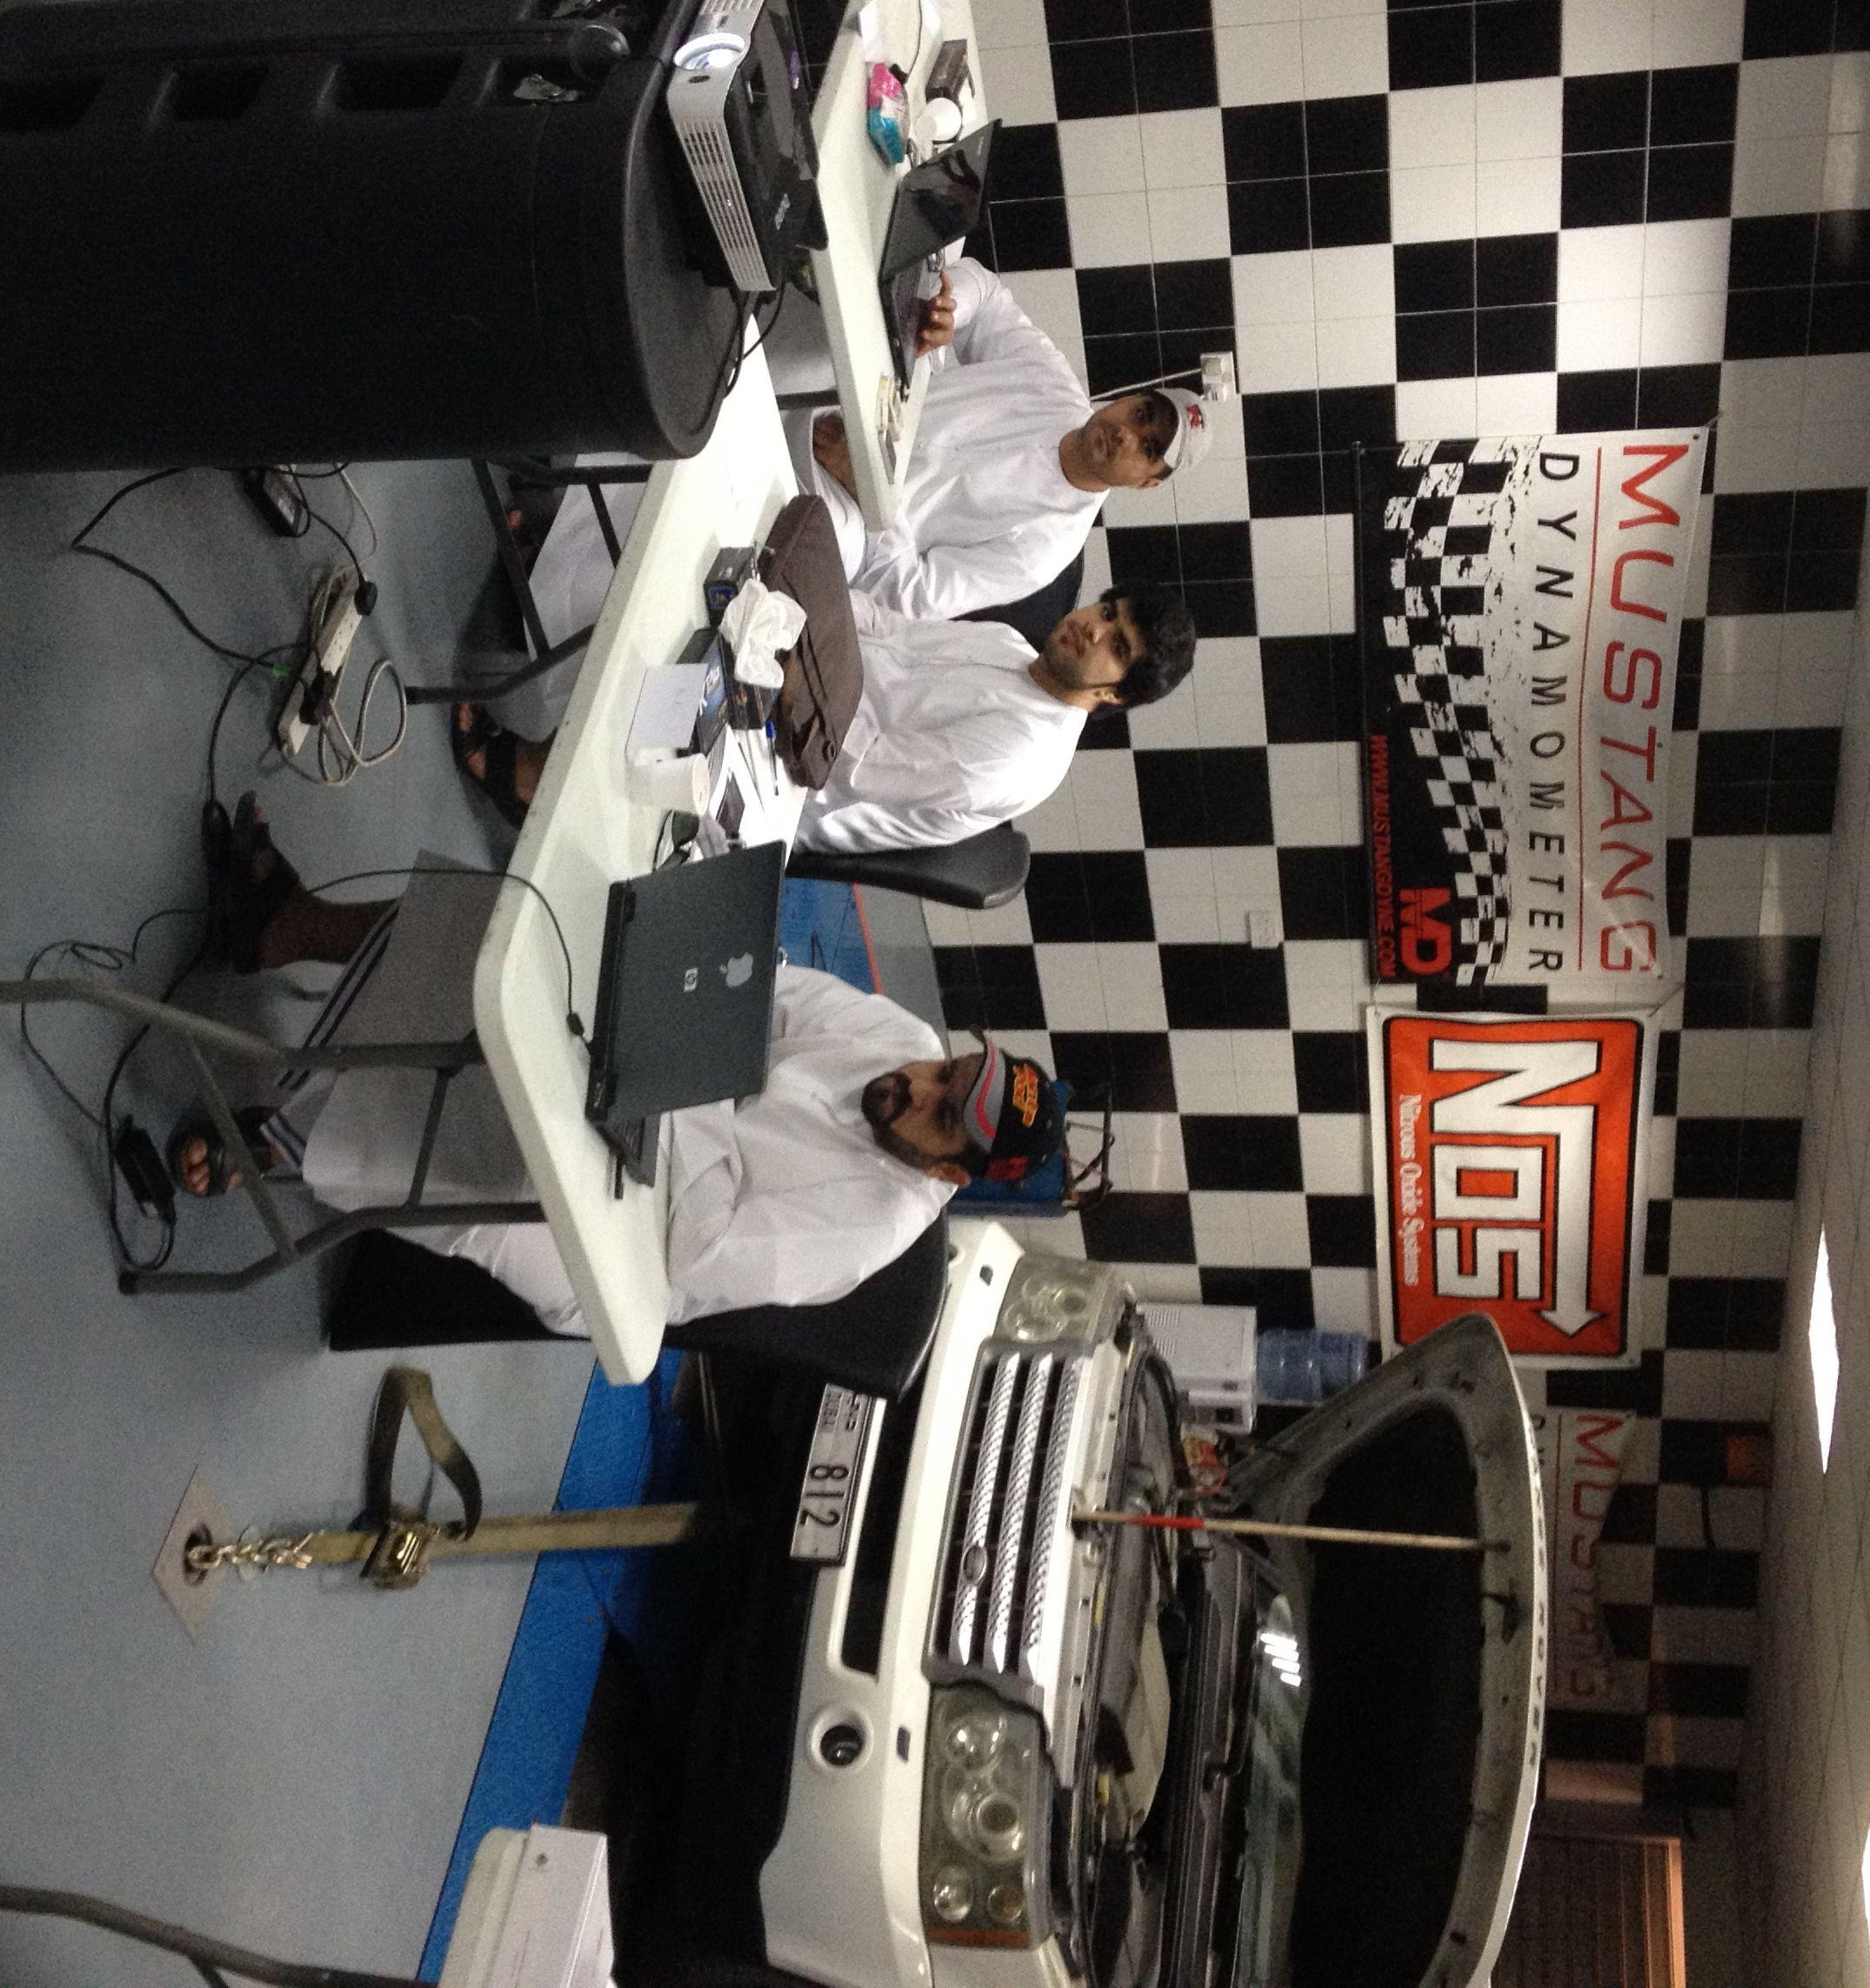 car tuning training and courses in Dubai | Dubai | Car tuning, Dubai